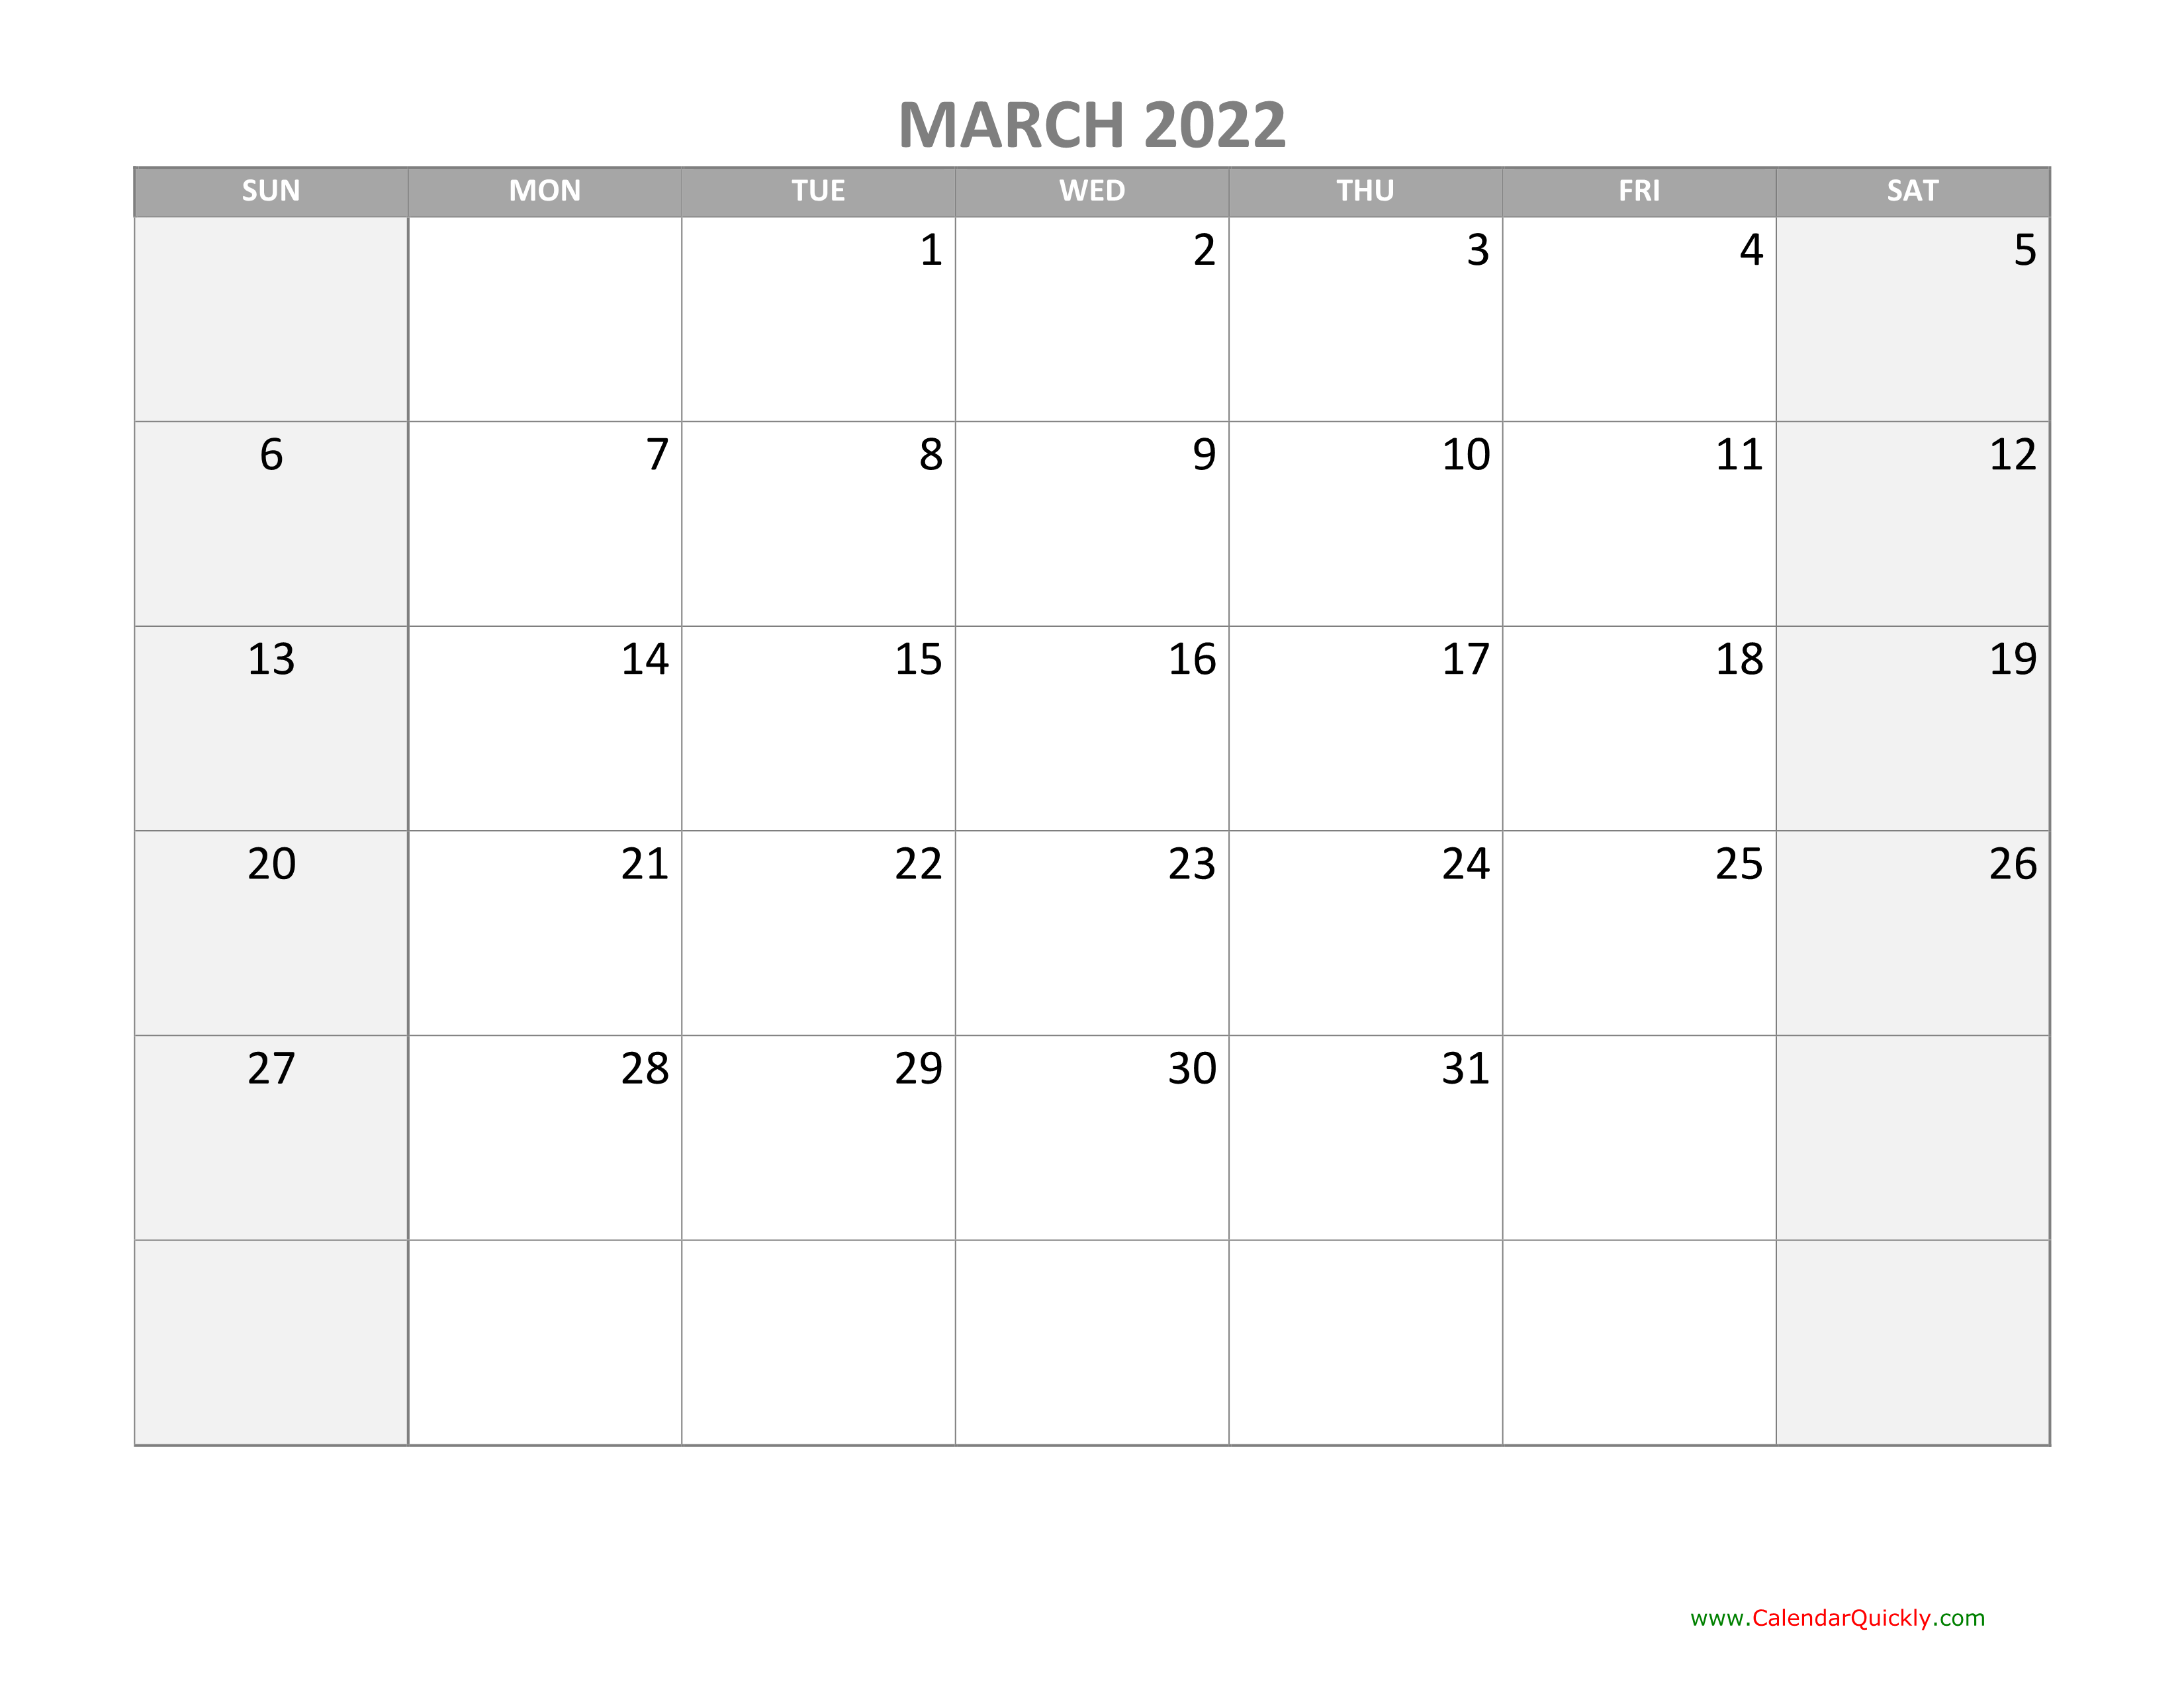 March Calendar 2022 with Holidays | Calendar Quickly